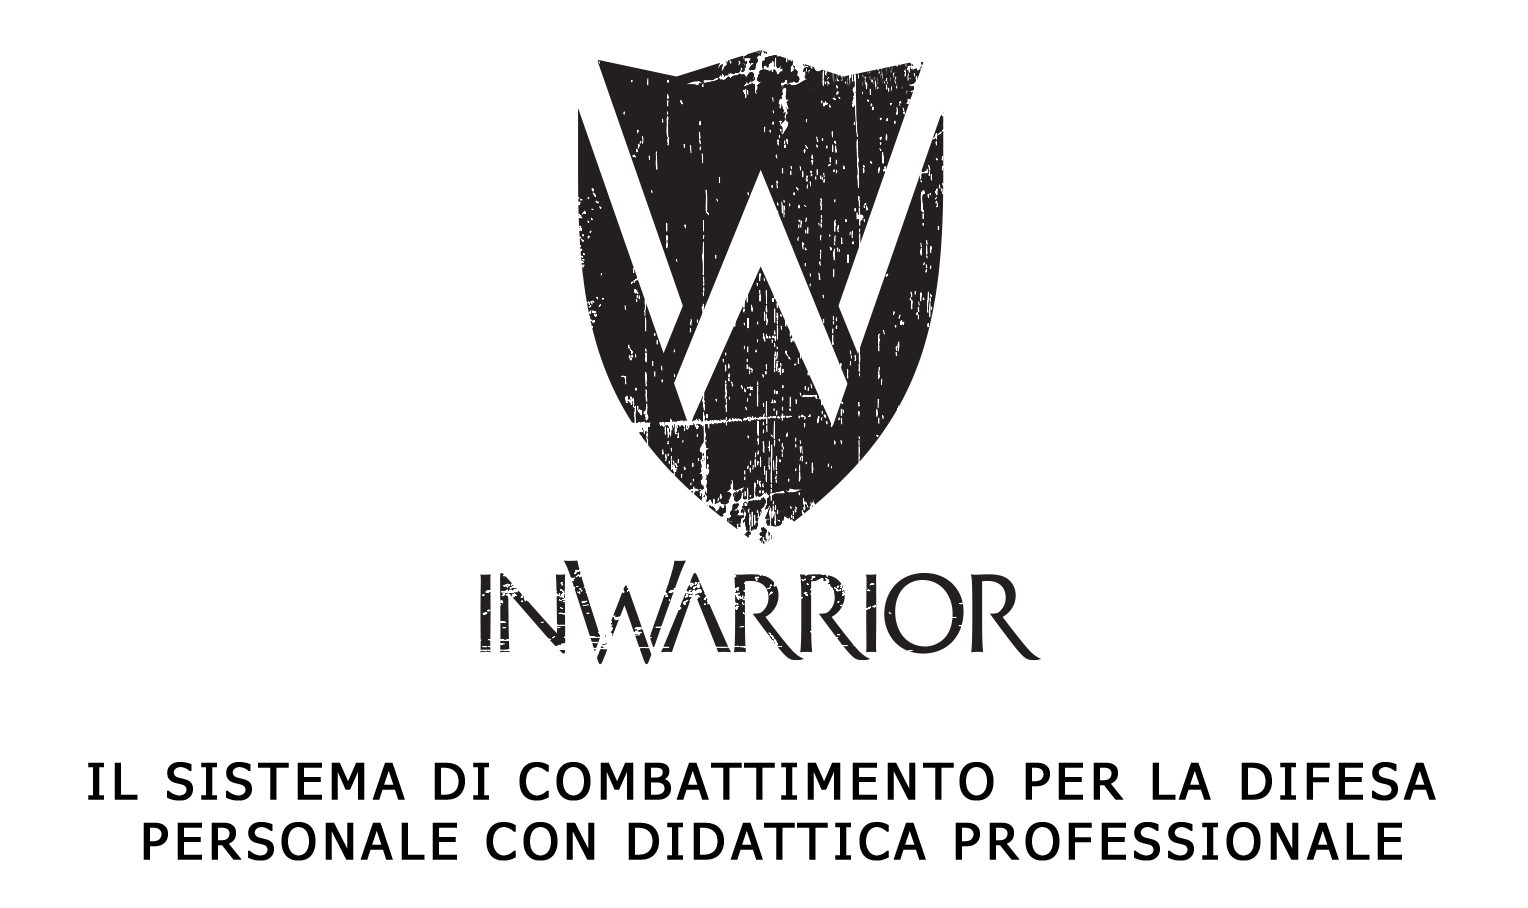 inWarrior